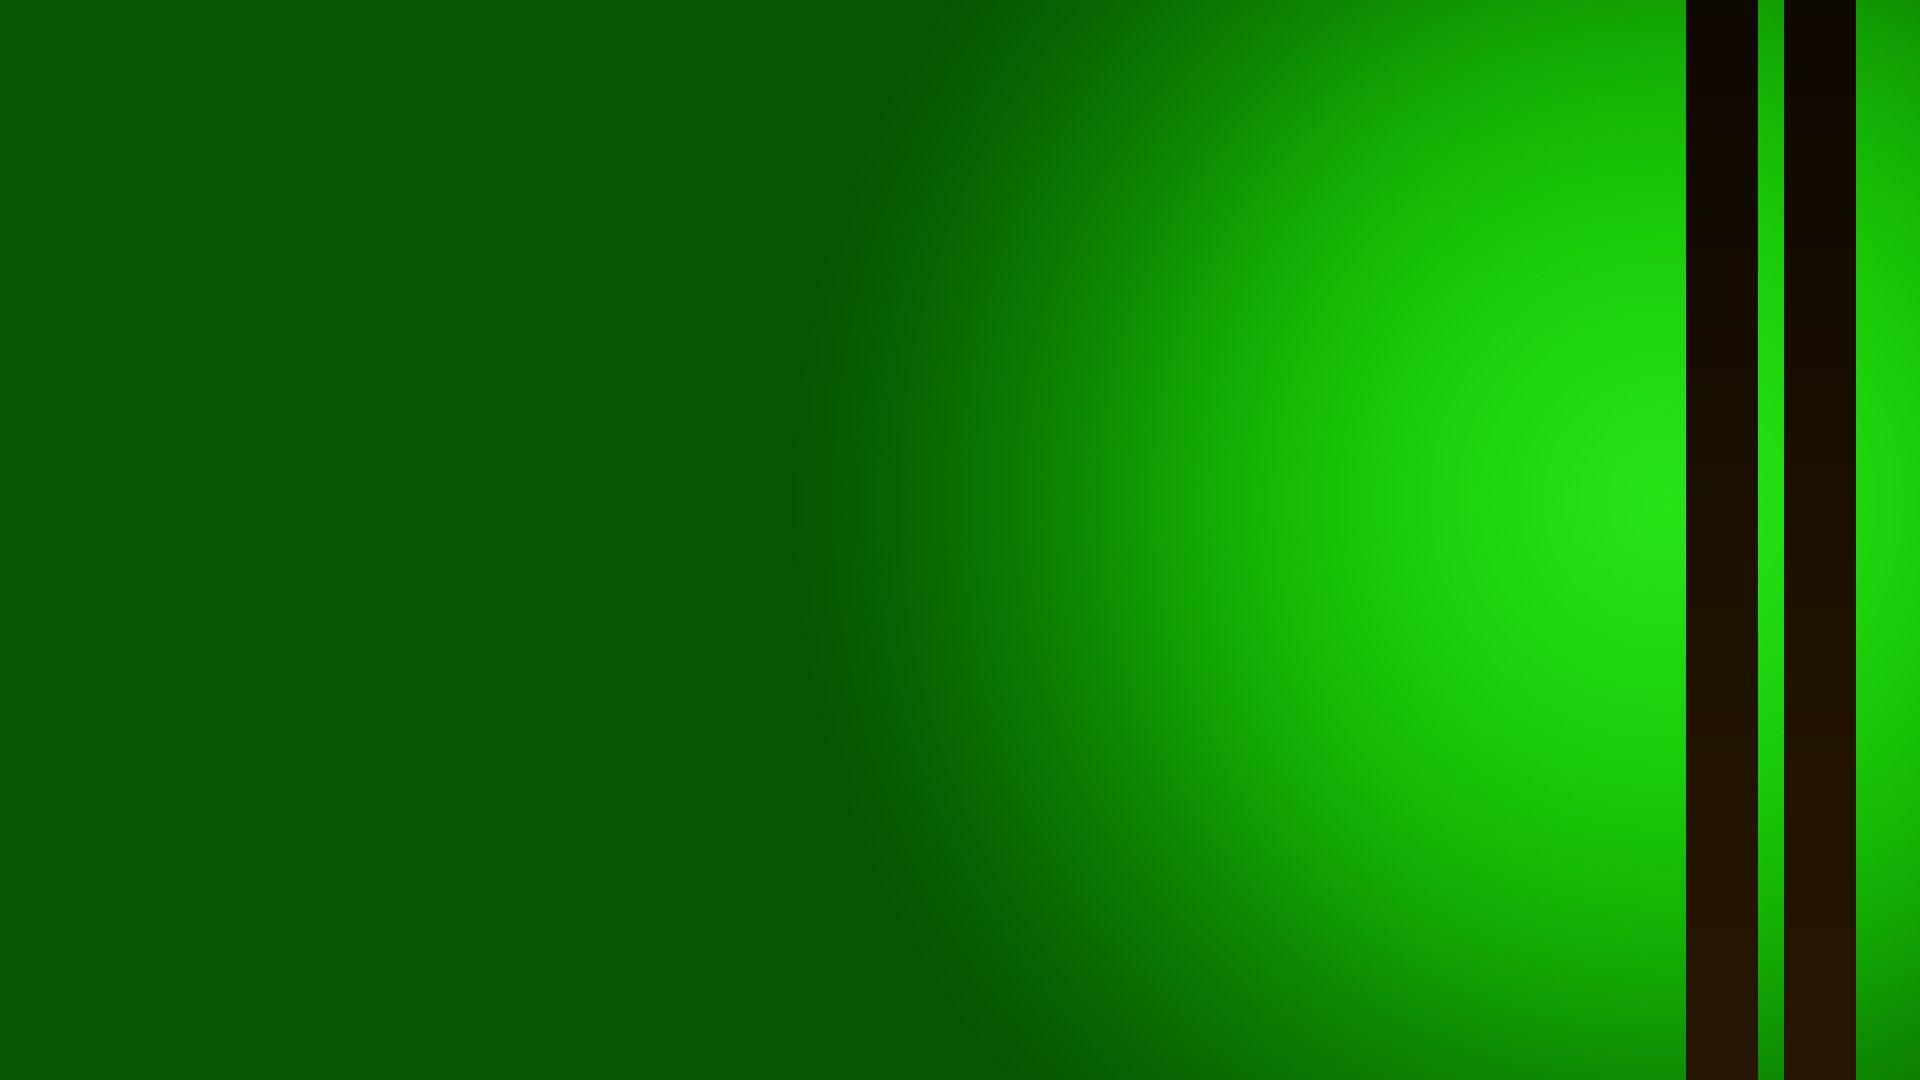 Green Hd Wallpapers Group 1920 1080 Green Wallpaper Hd (61